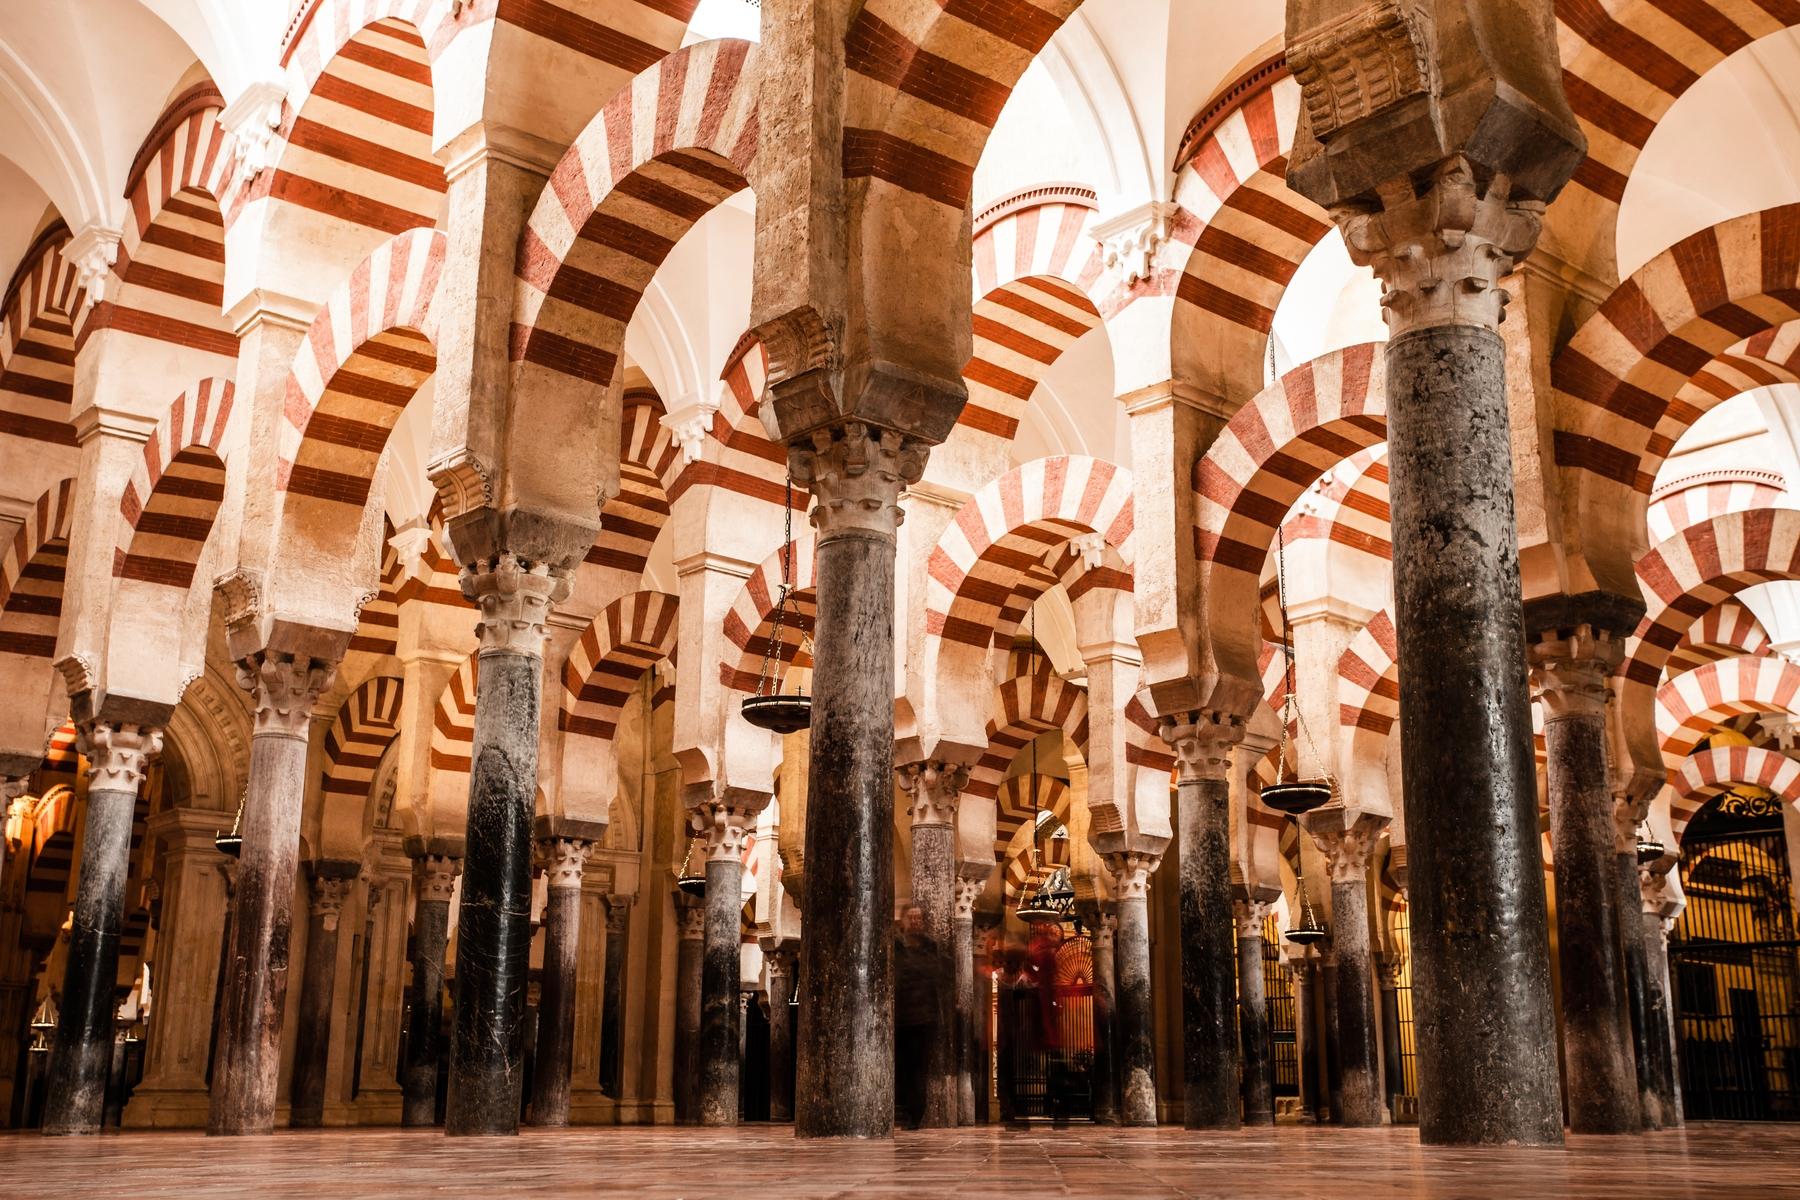 La Mezquita-Catedral, el imprescindible que ver en Córdoba